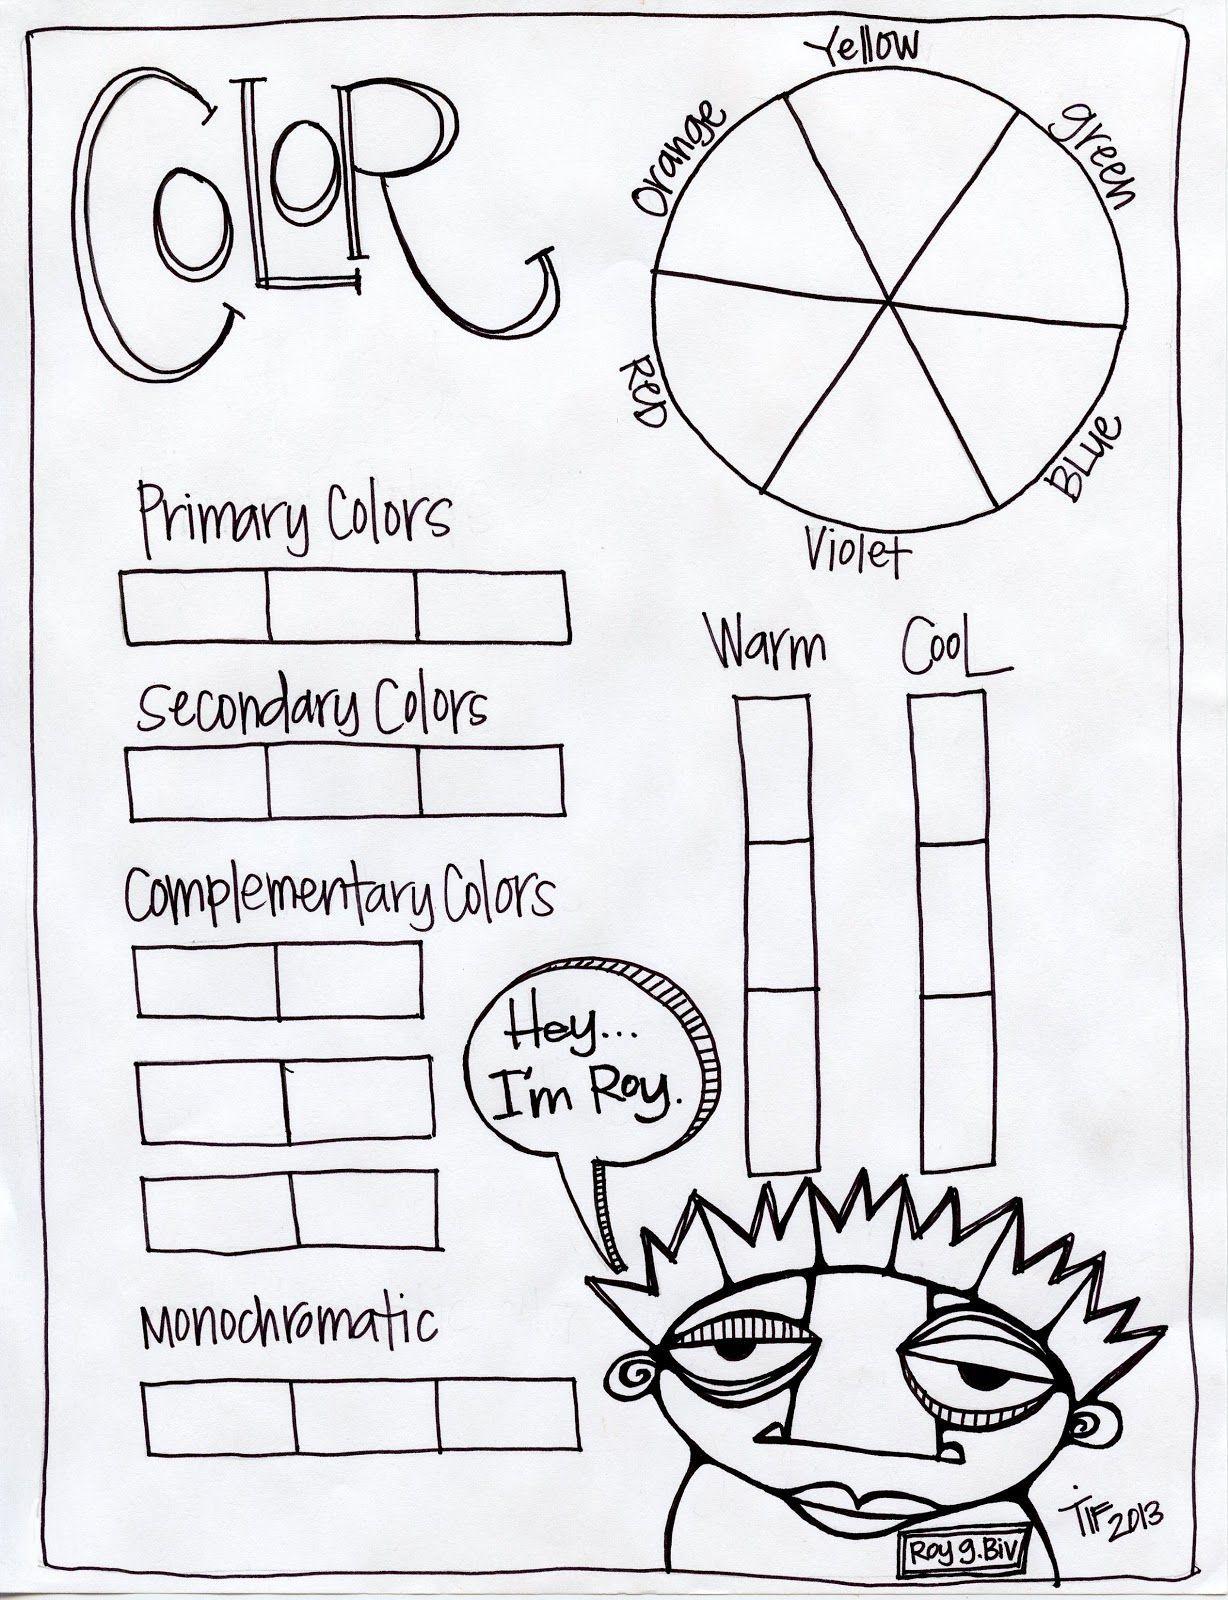 Worksheets Color Theory Worksheet Cheatslist Free